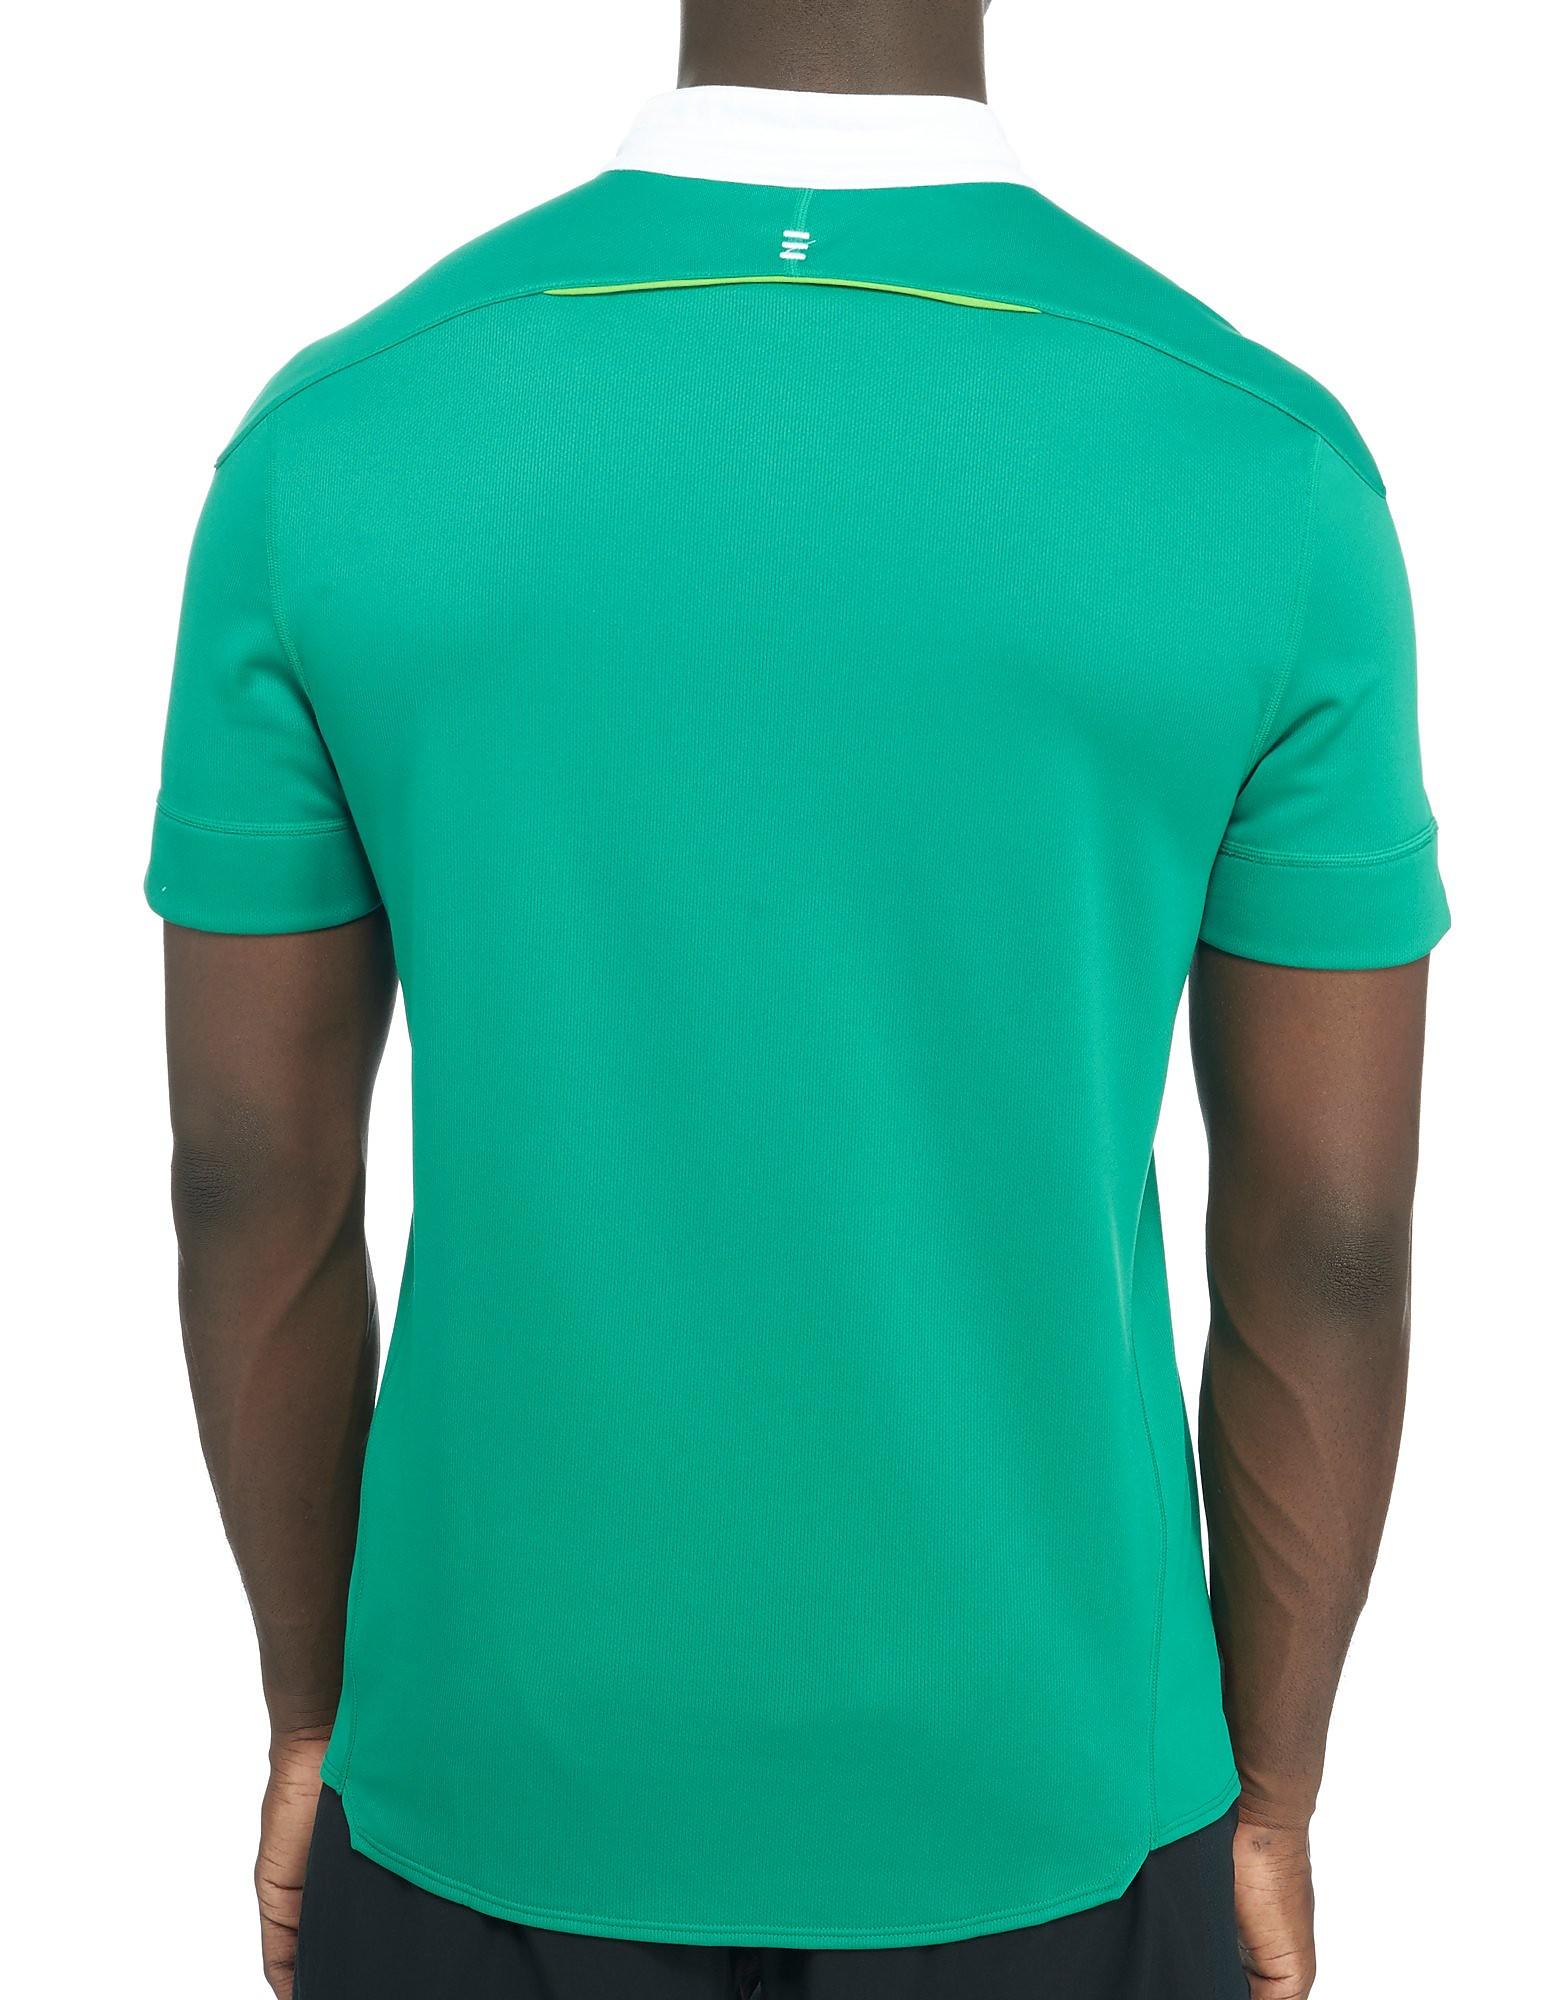 Canterbury IRFU 2016/17 Home Pro Shirt